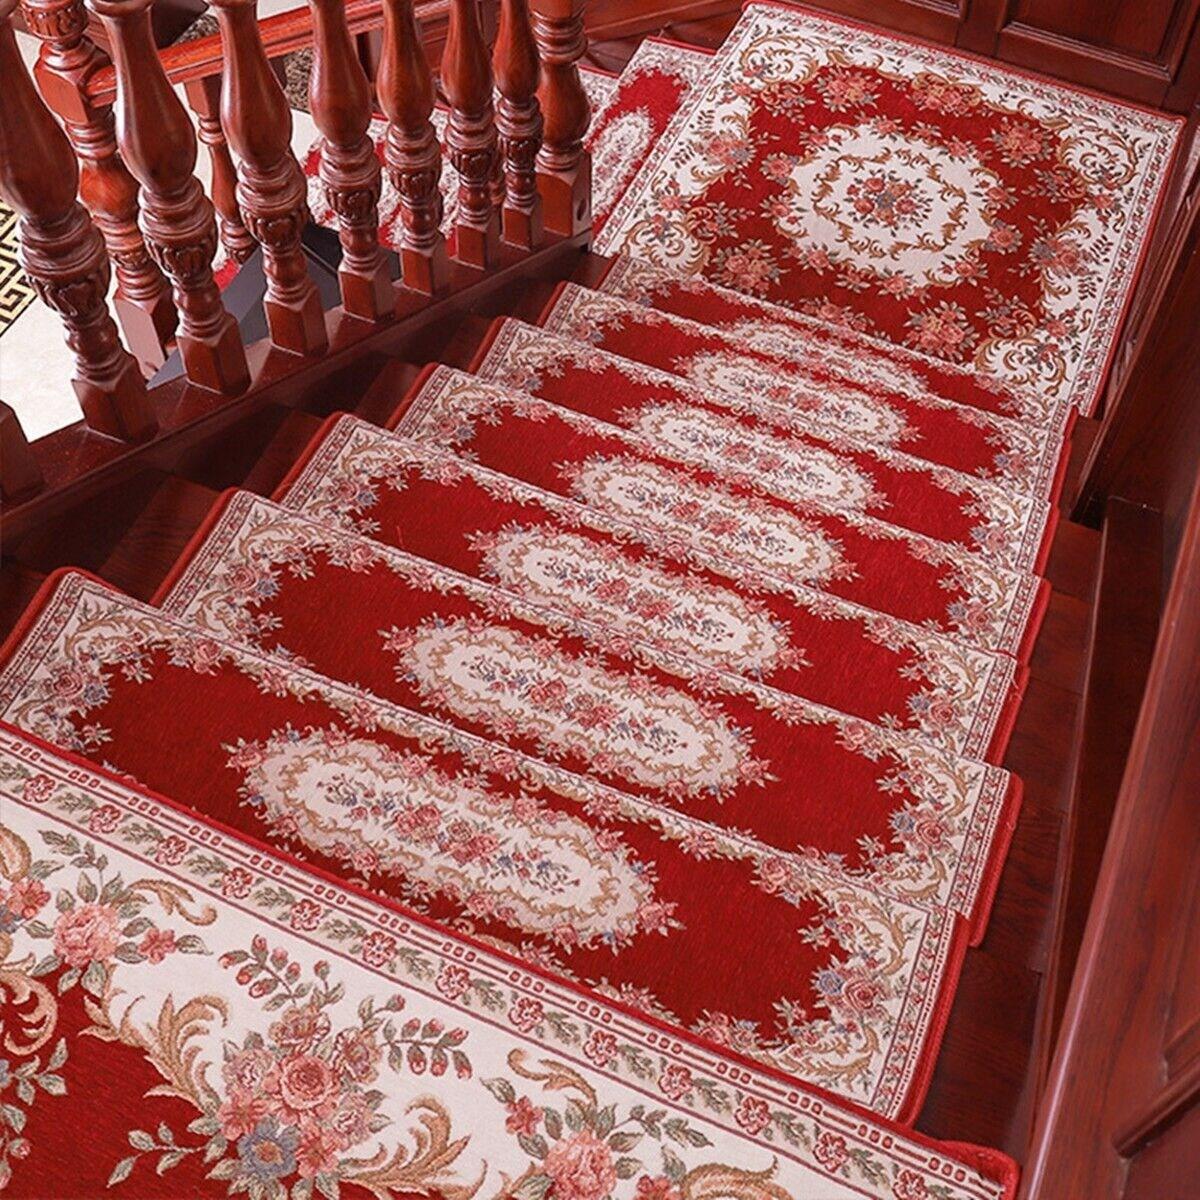 1 7Pcs Thick Non Slip Staircase Floor Carpet Stair Mats Rugs Pads   Thick Carpet Stair Treads   Stair Runner   Montauk Linen   Flooring   Skid Resistant   Grey